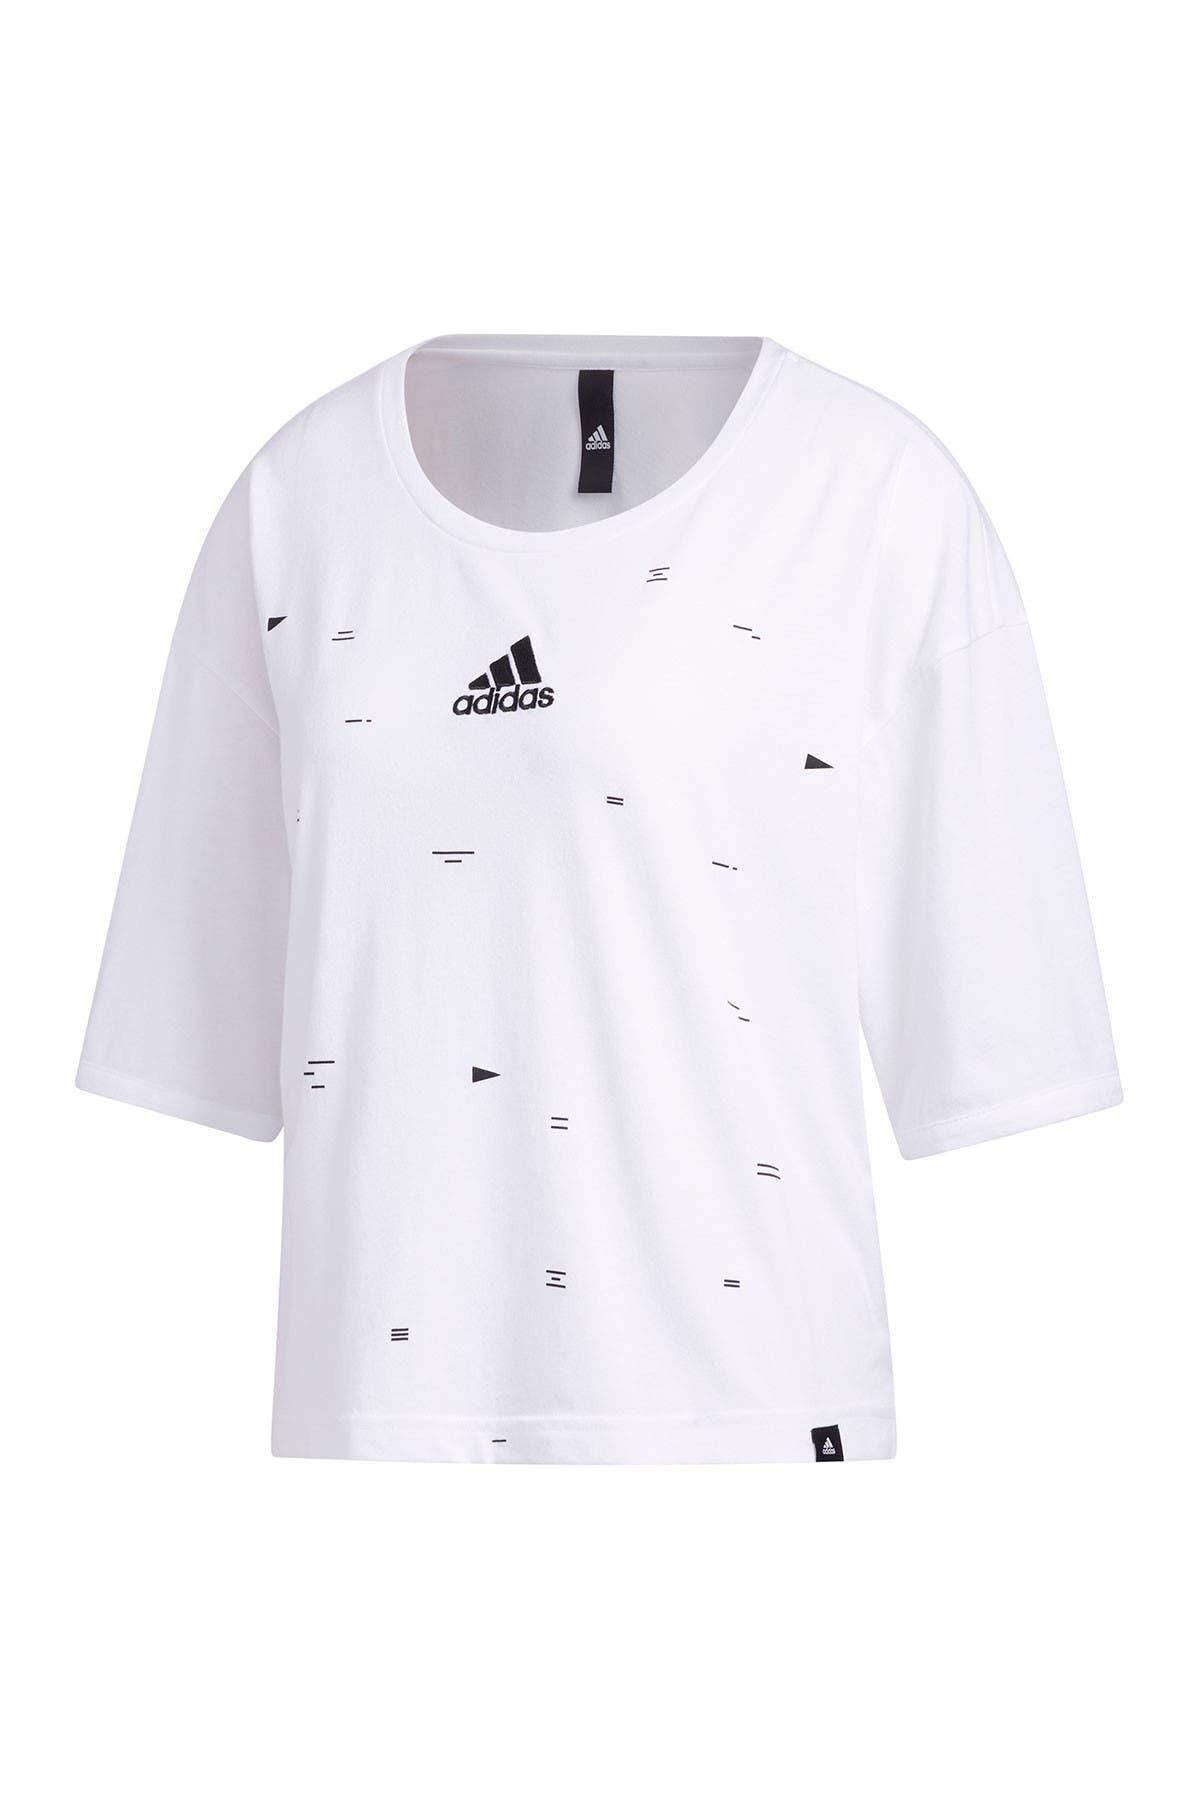 Image of adidas Graphic Geo Print T-Shirt